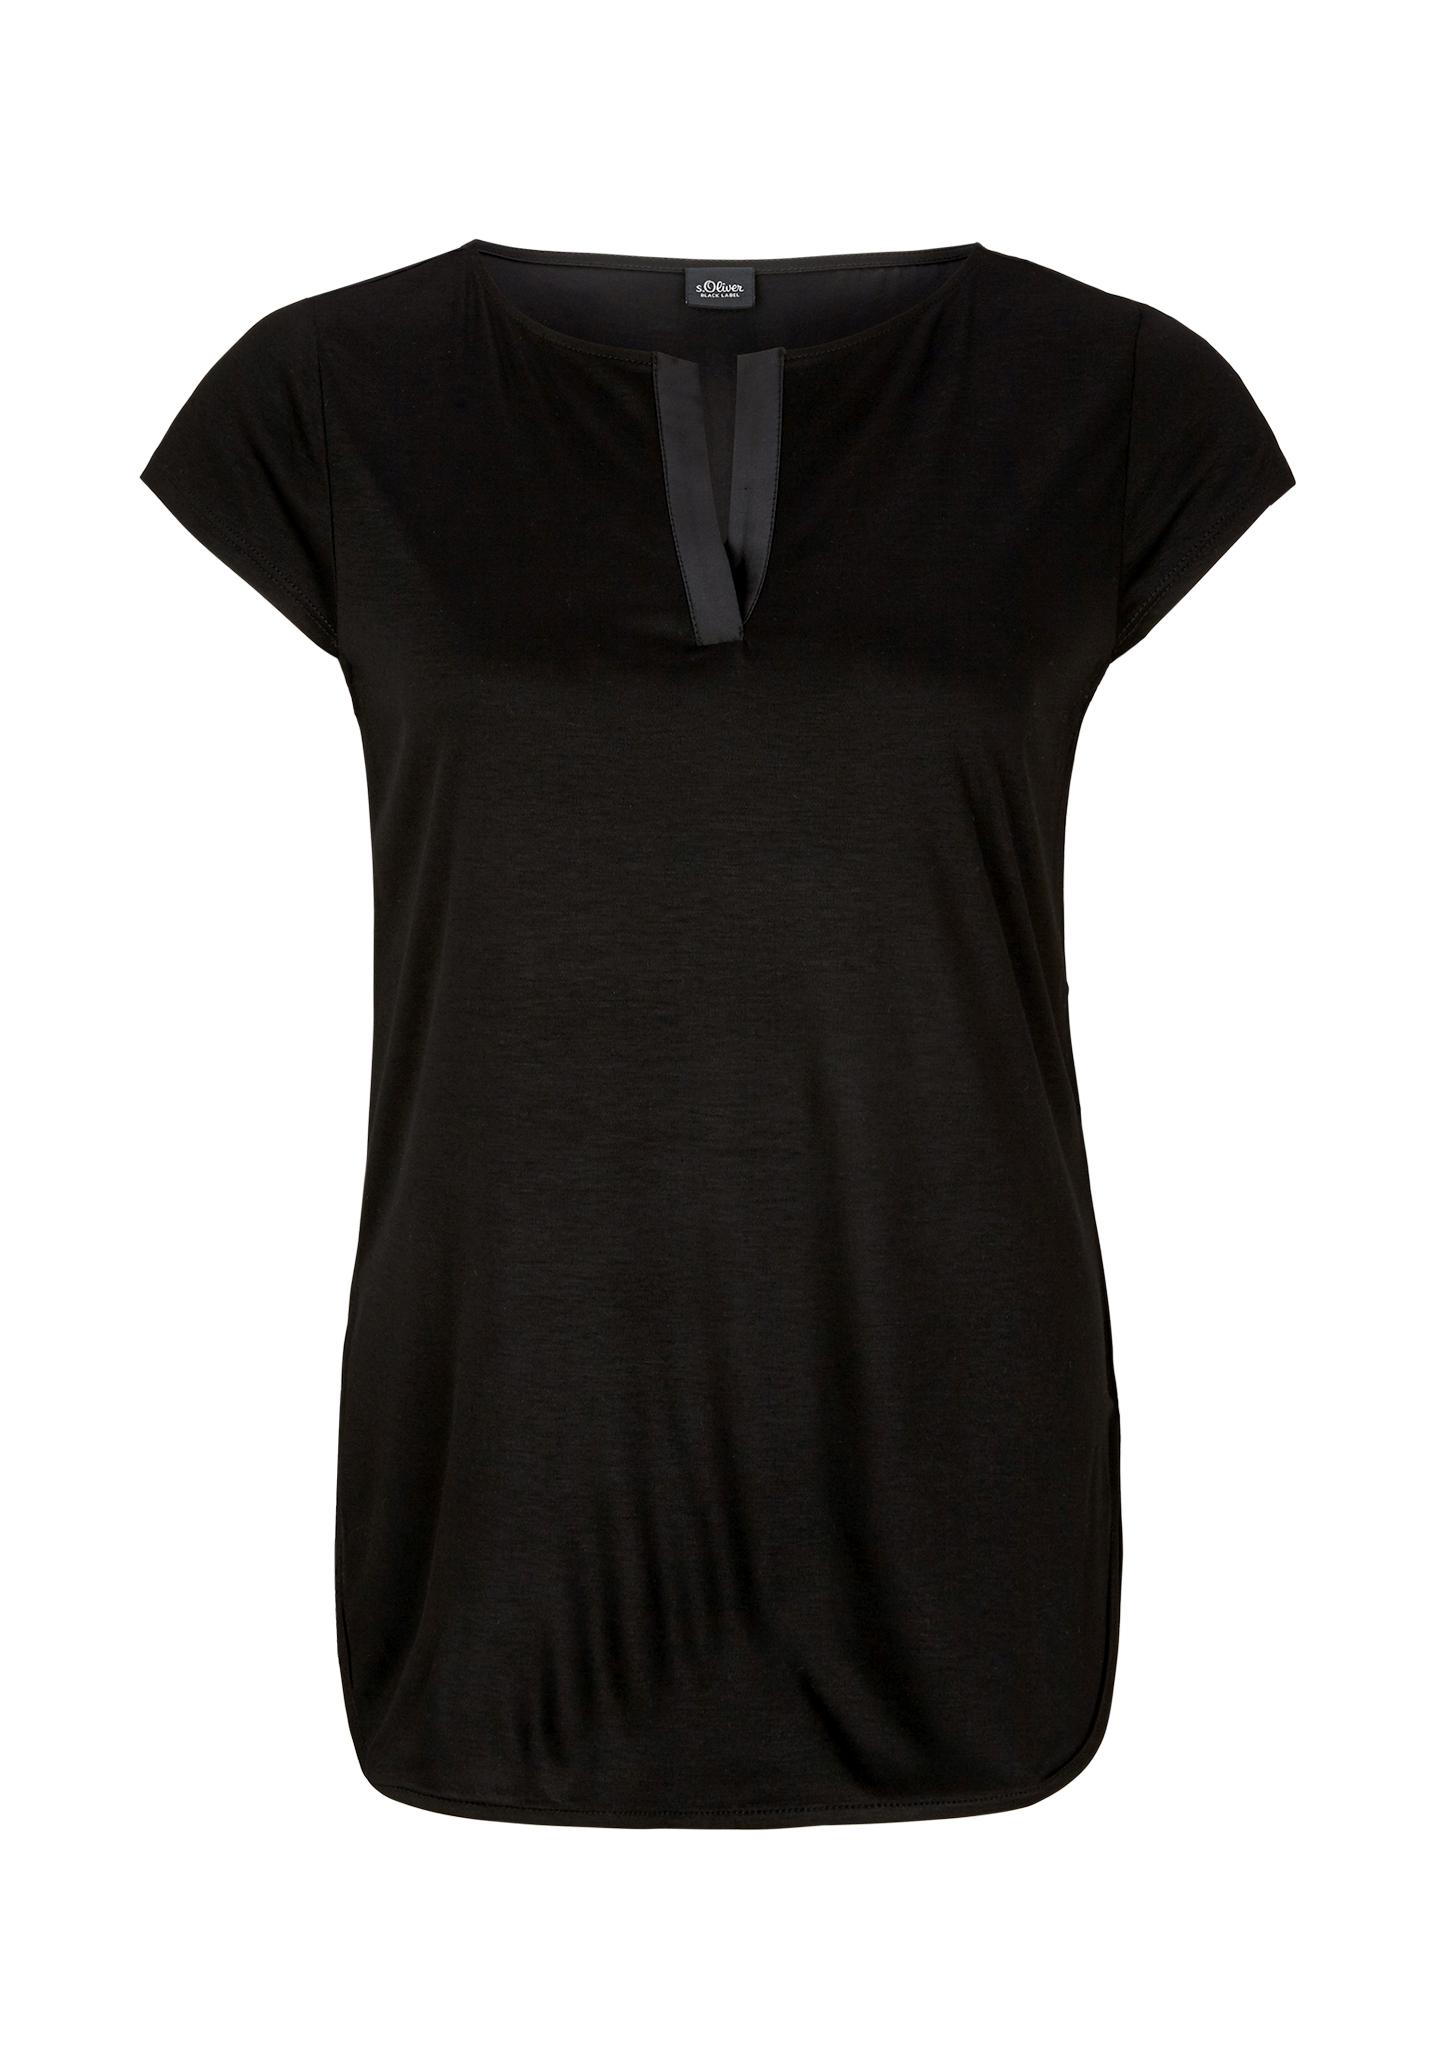 Tunikashirt | Bekleidung > Shirts > Tunikashirts | s.Oliver BLACK LABEL